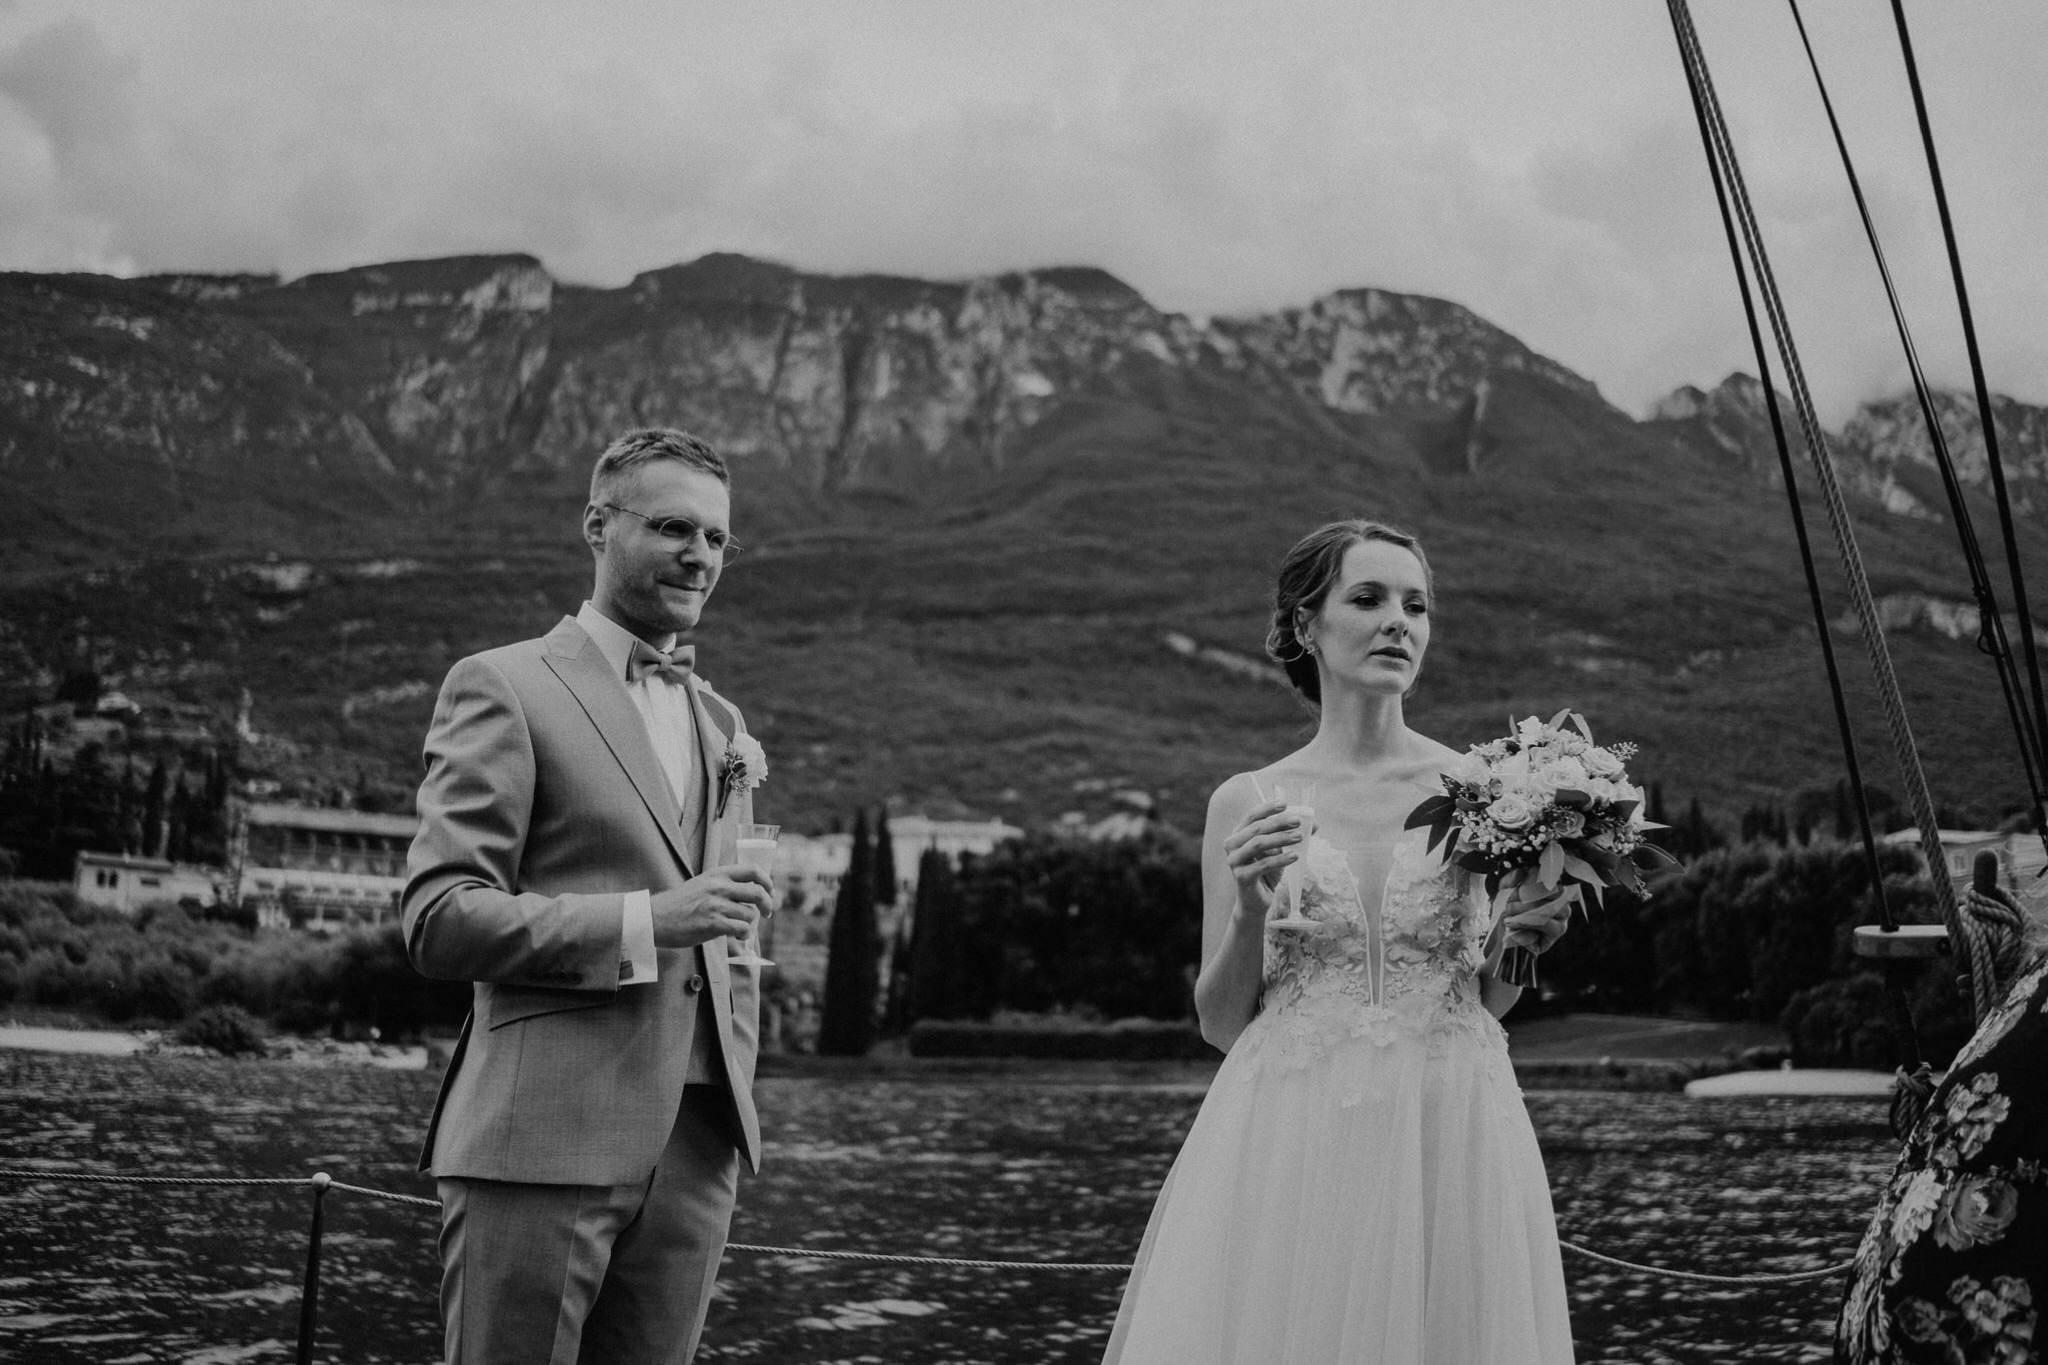 25 la 02 bootsfahrt 1138 weddinphotographer Hochzeitsfotograf newzealand hamilton Weddingphotography Stuttgart